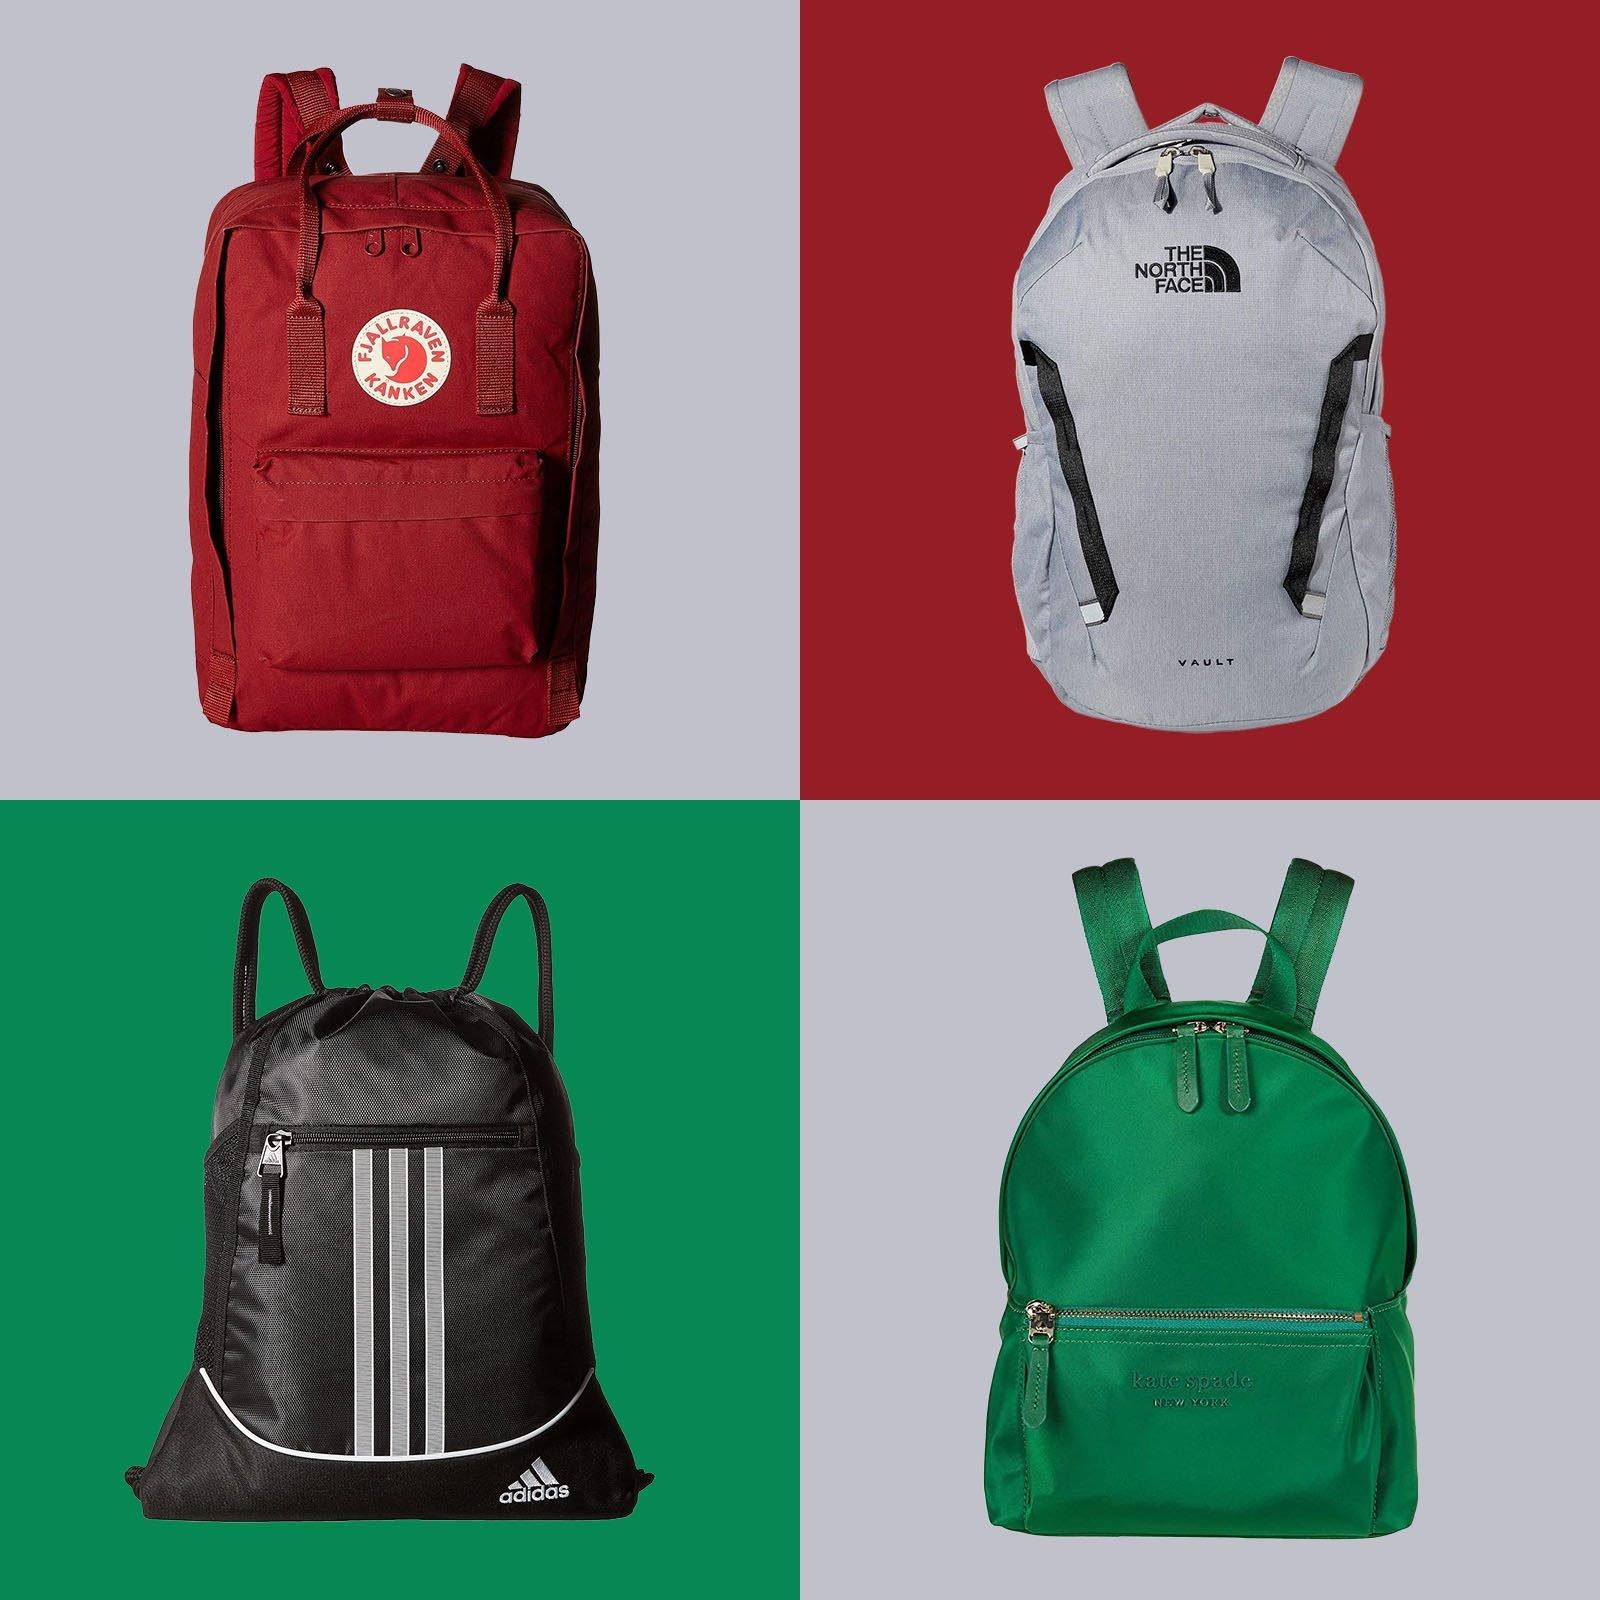 Four backpacks on multicolor tile background